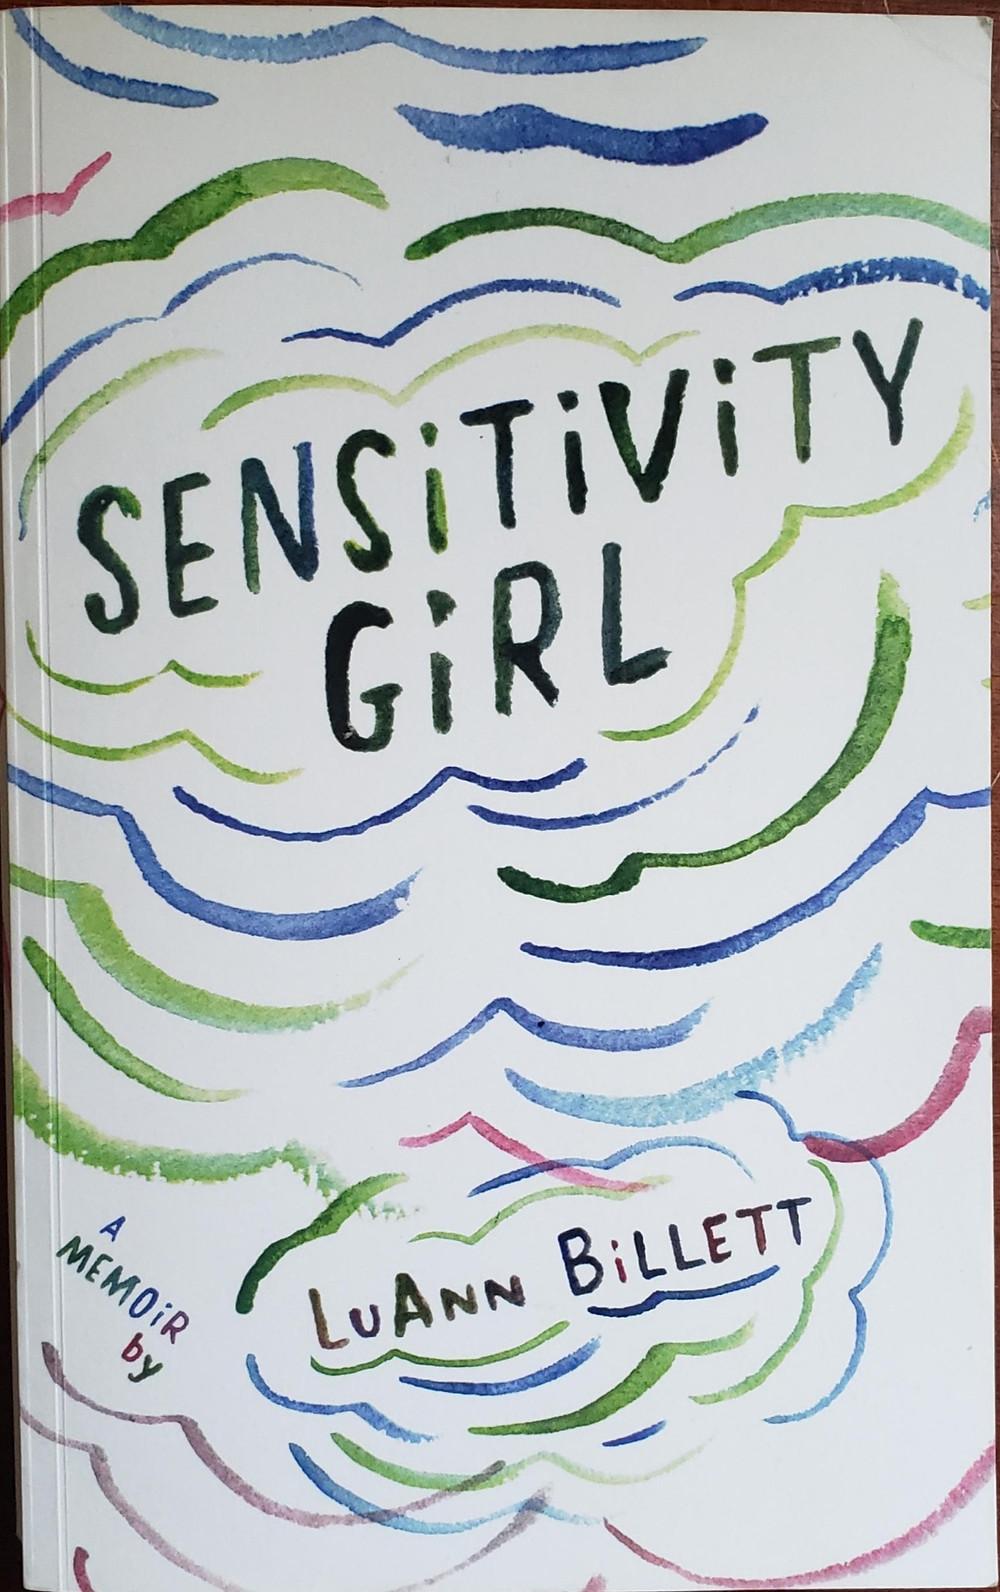 Front image of book cover for Sensitivity Girl by LuAnn Billett.